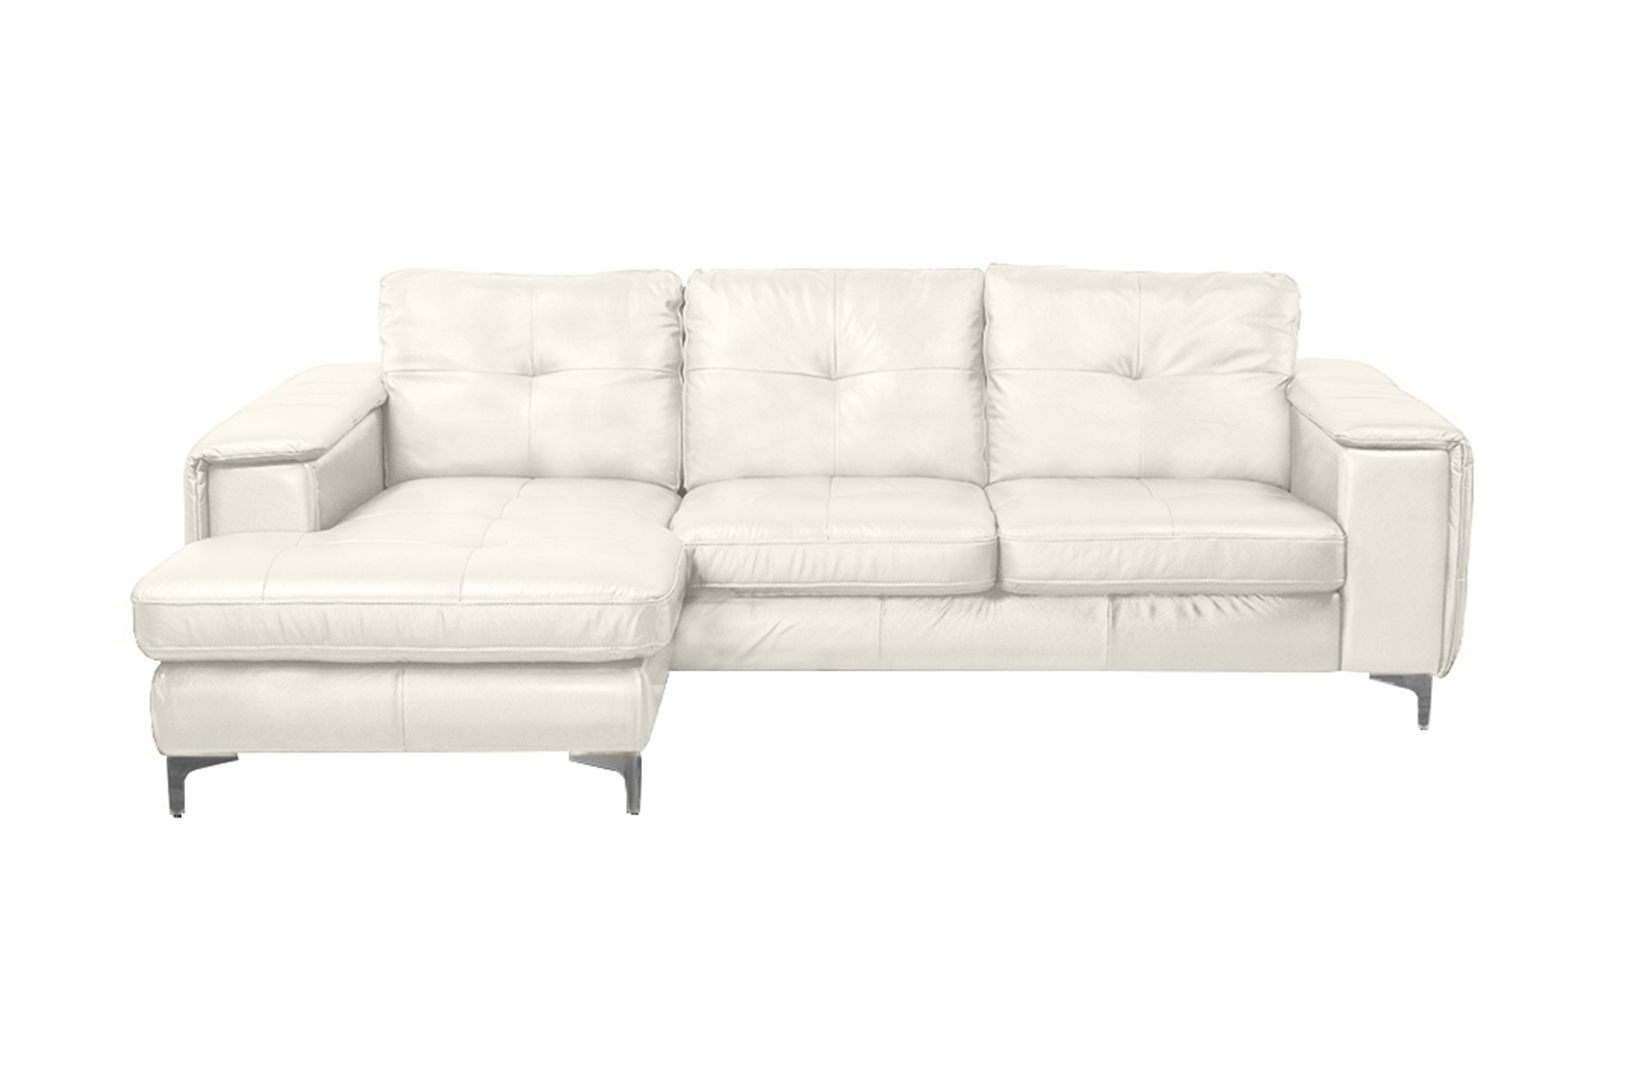 left arm return sofa rattan half moon set mixed chocolate frankfurt sectional chaise facing snow white by